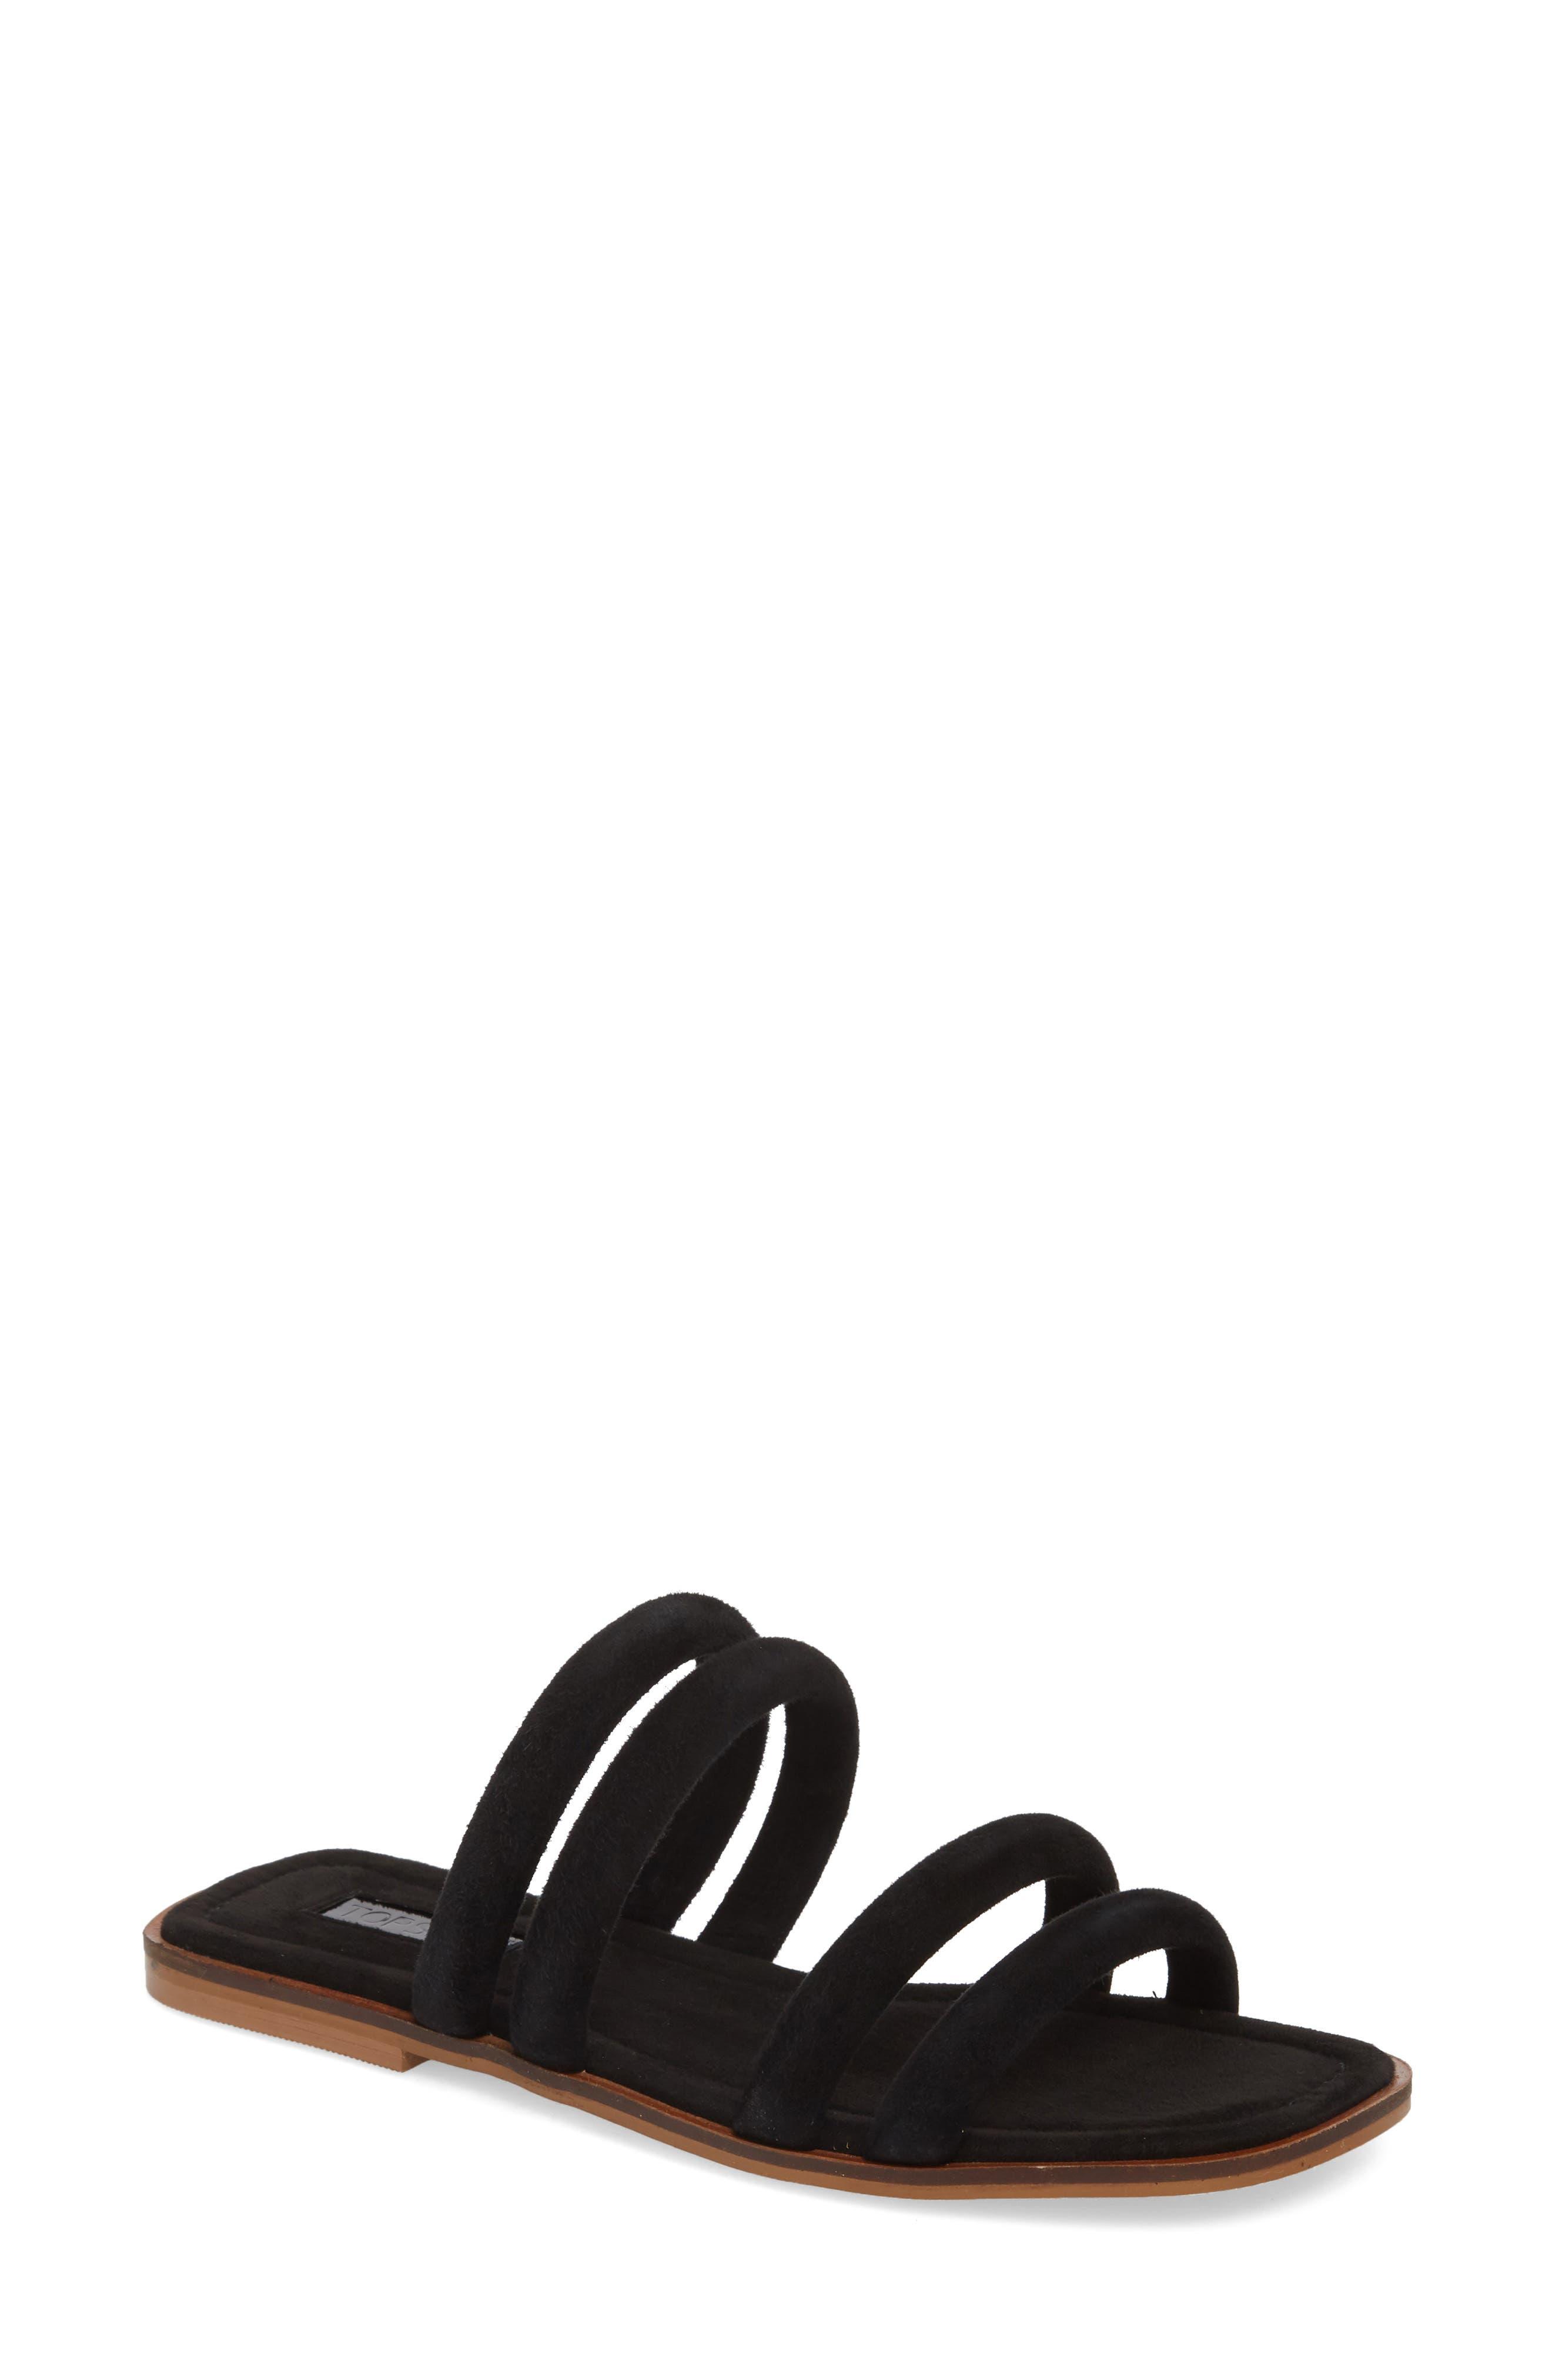 Fever Strappy Sandal,                         Main,                         color, 001